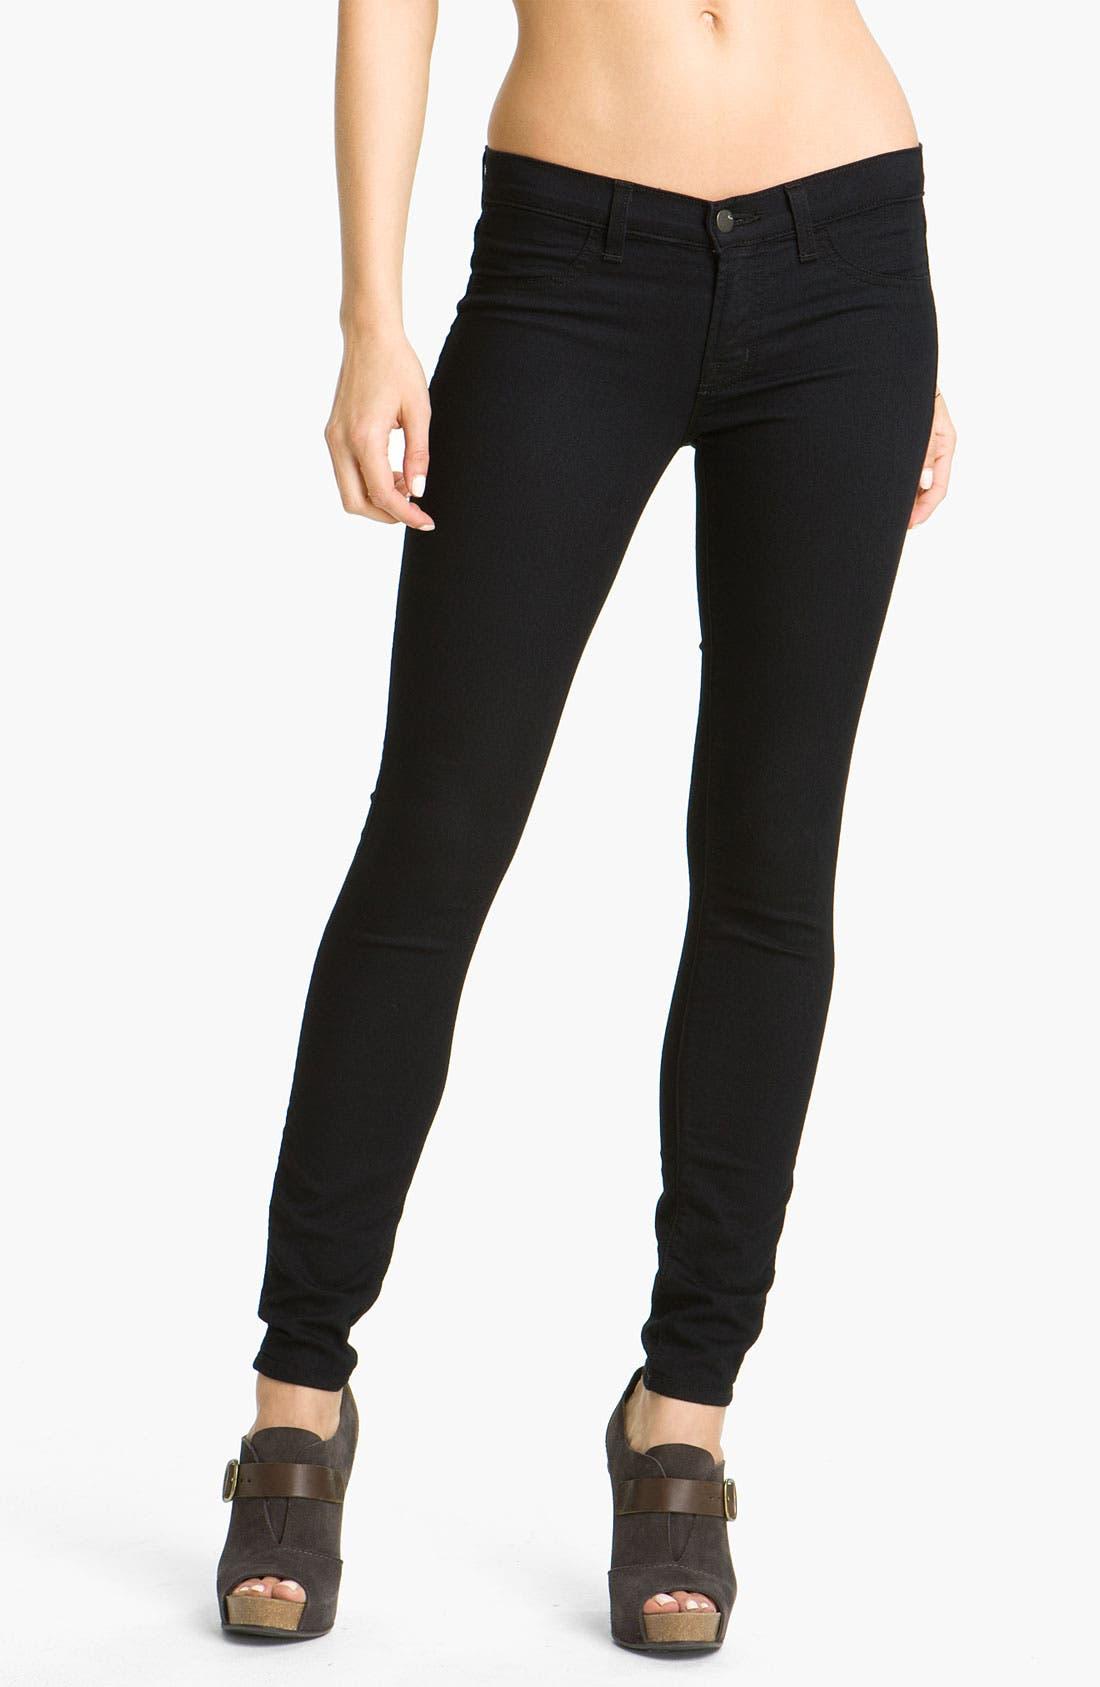 J BRAND,                             'Legging' Stretch Jeans,                             Main thumbnail 1, color,                             002